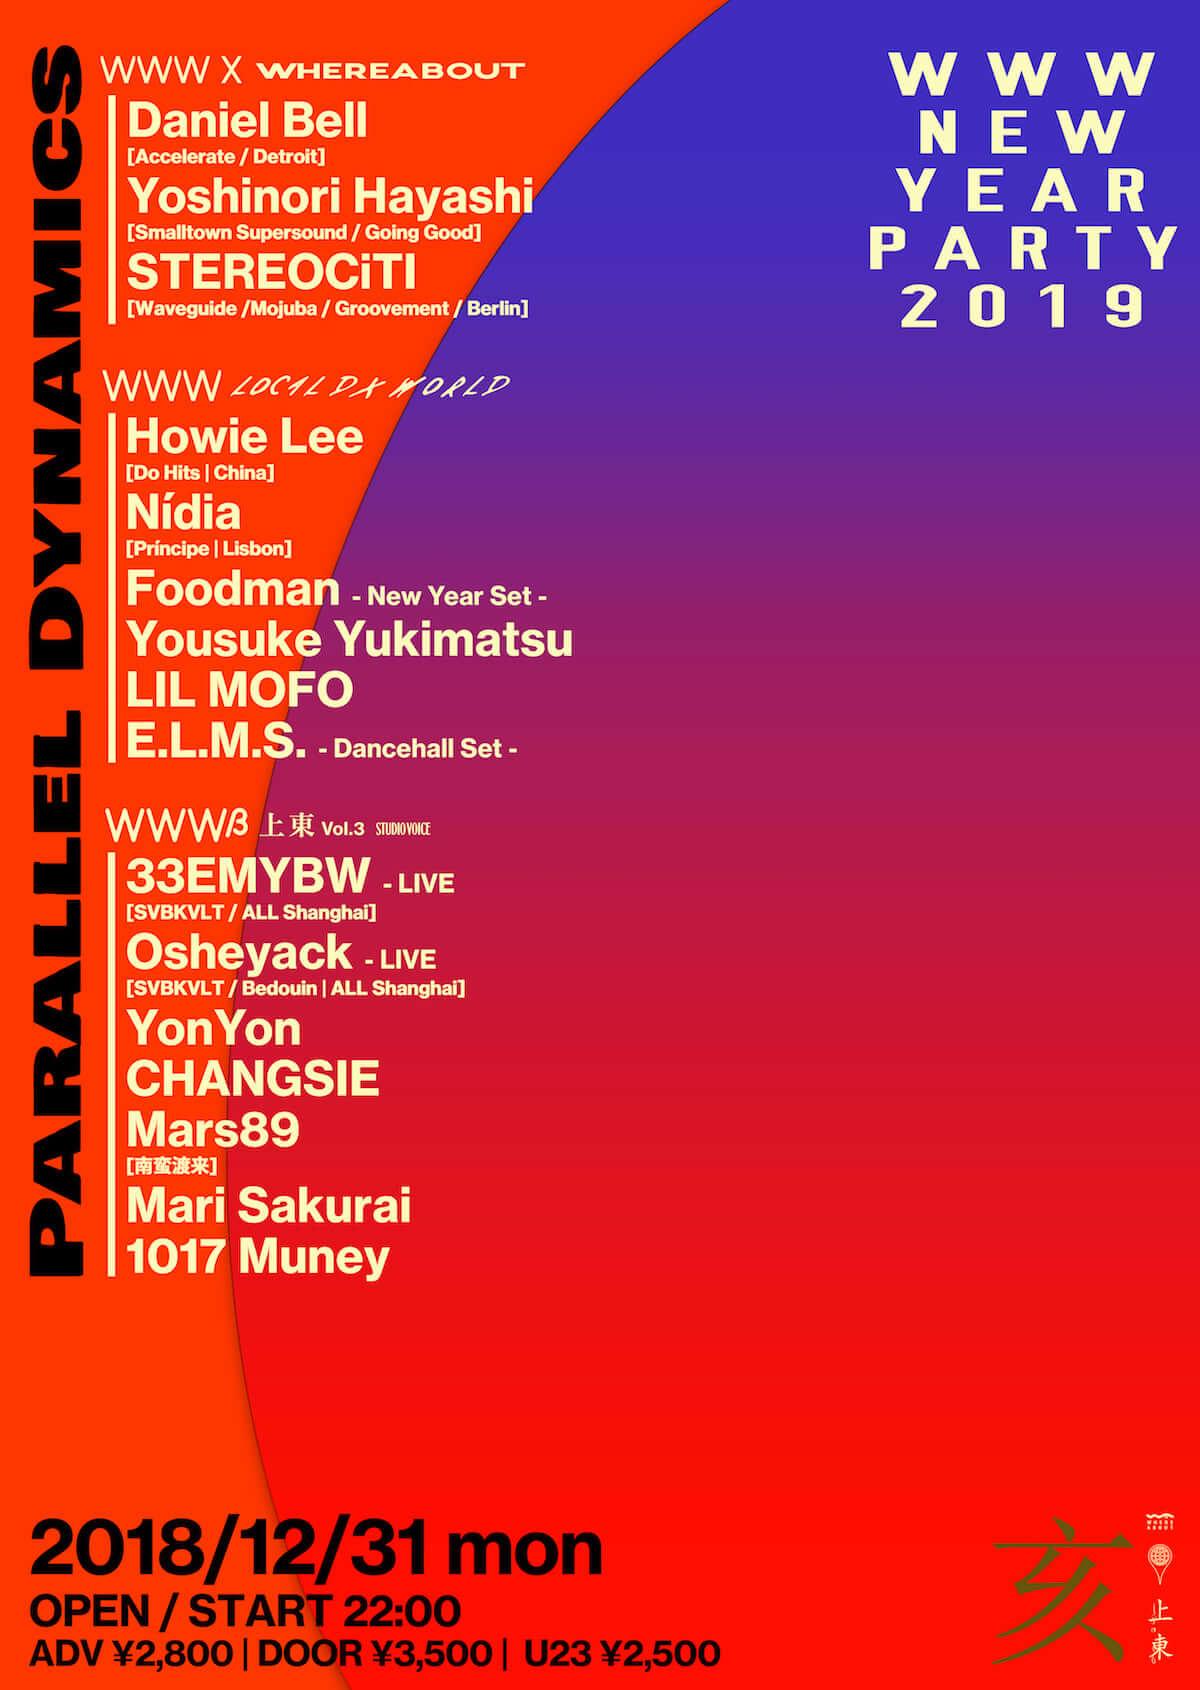 WWWのニューイヤーパーティに33EMYBWとOsheyackが初来日、YonYonやCHANGSIE、Mars89、Mari Sakurai、1017 Muneyらが出演 music181218-www-new-year-party2019-2-1200x1690